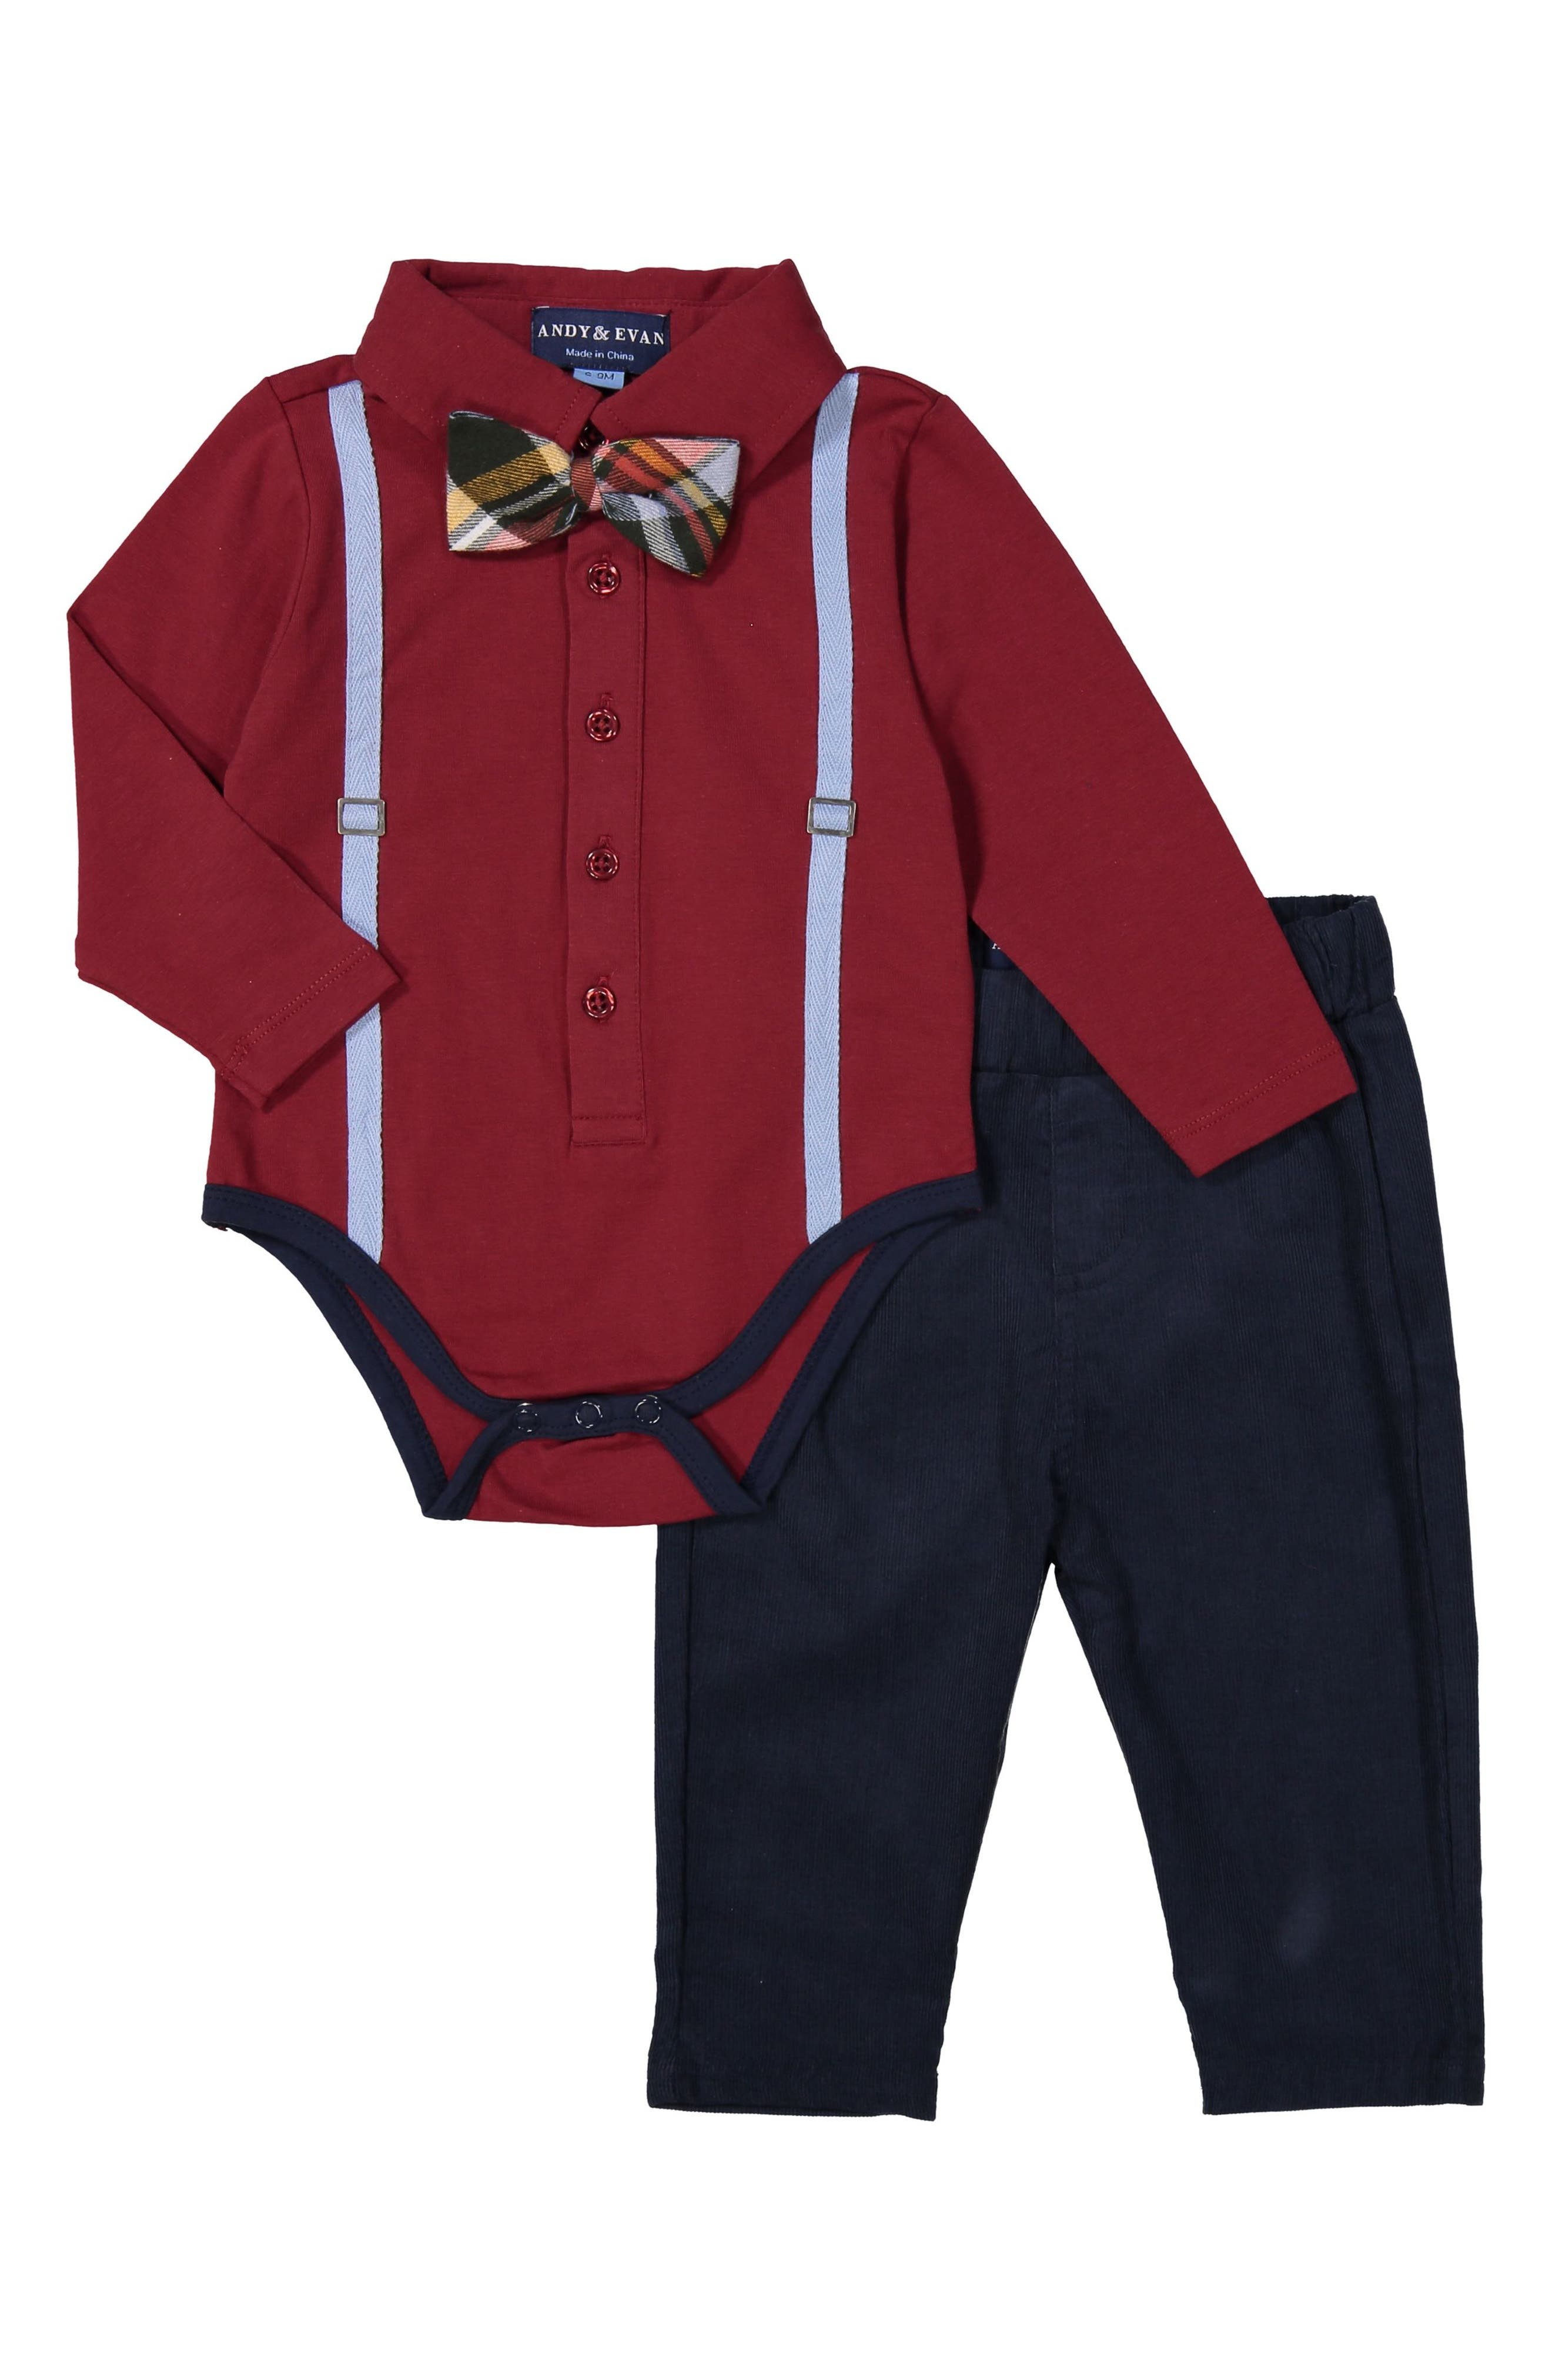 Andy & Evan Bodysuit, Bow Tie & Pants Set (Baby Boy)